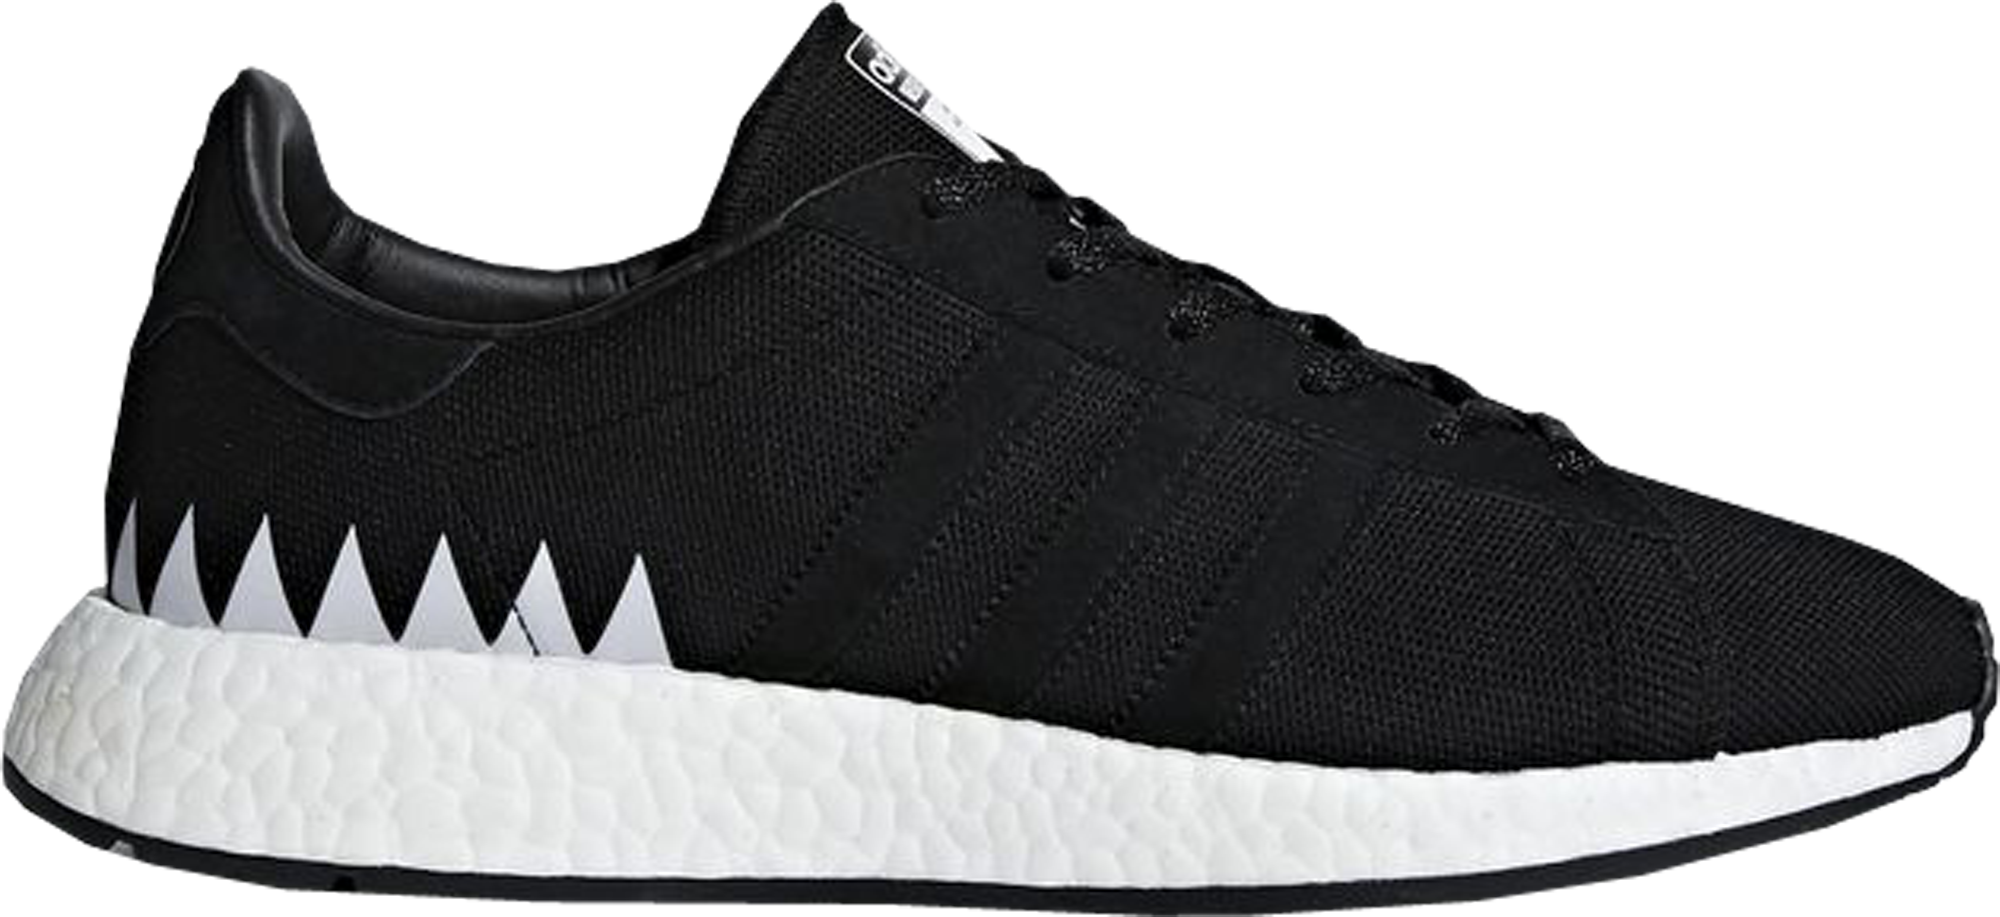 adidas Chop Shop Neighborhood Core Black